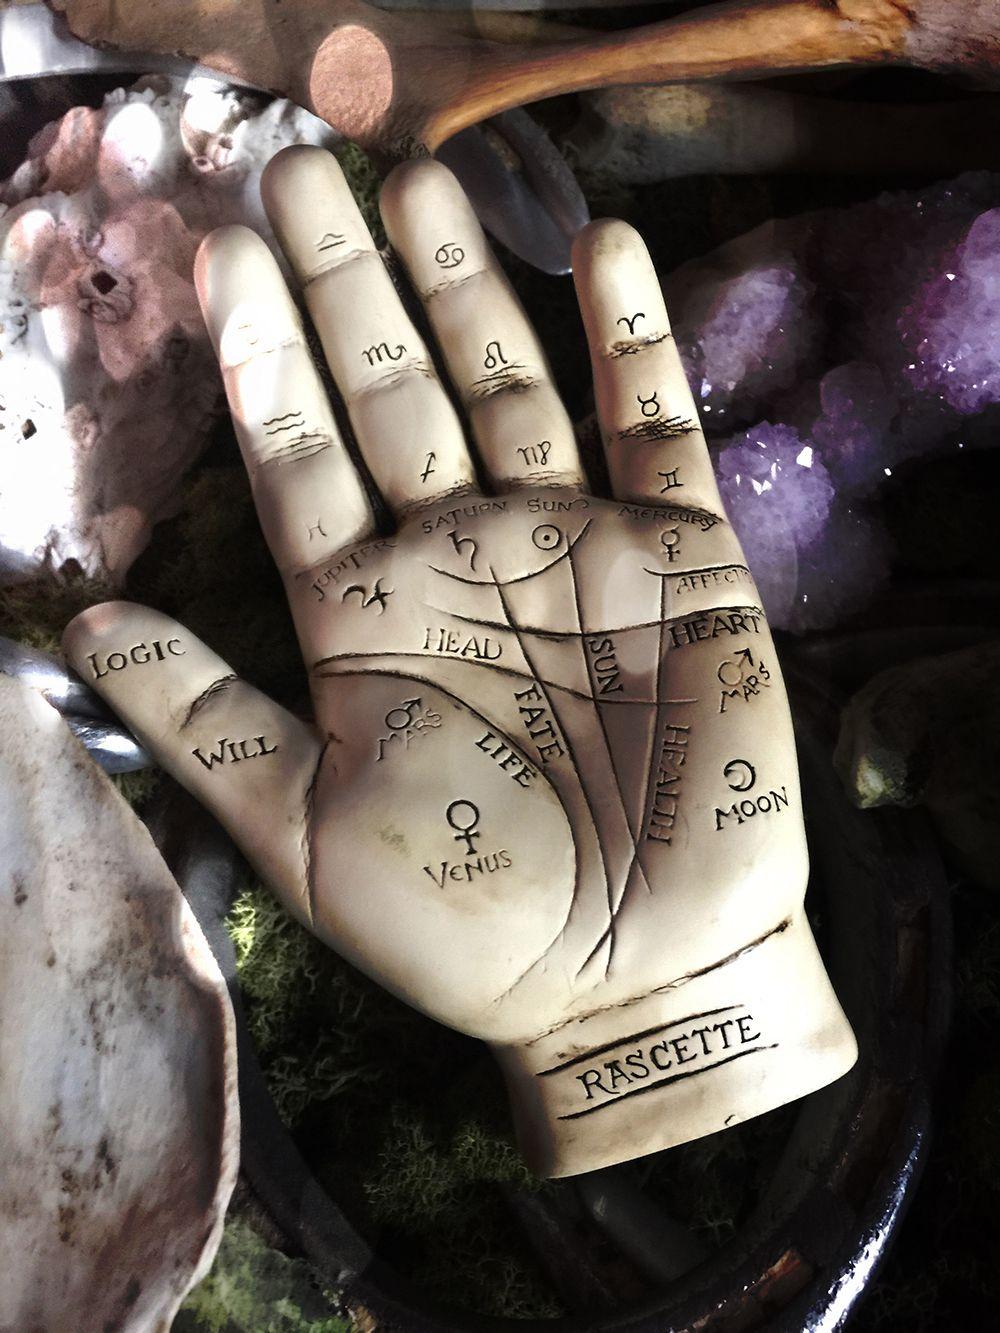 Palmistry Sculpture Booklet Palmistry Hand Palmistry Palm Reading [ 1333 x 1000 Pixel ]